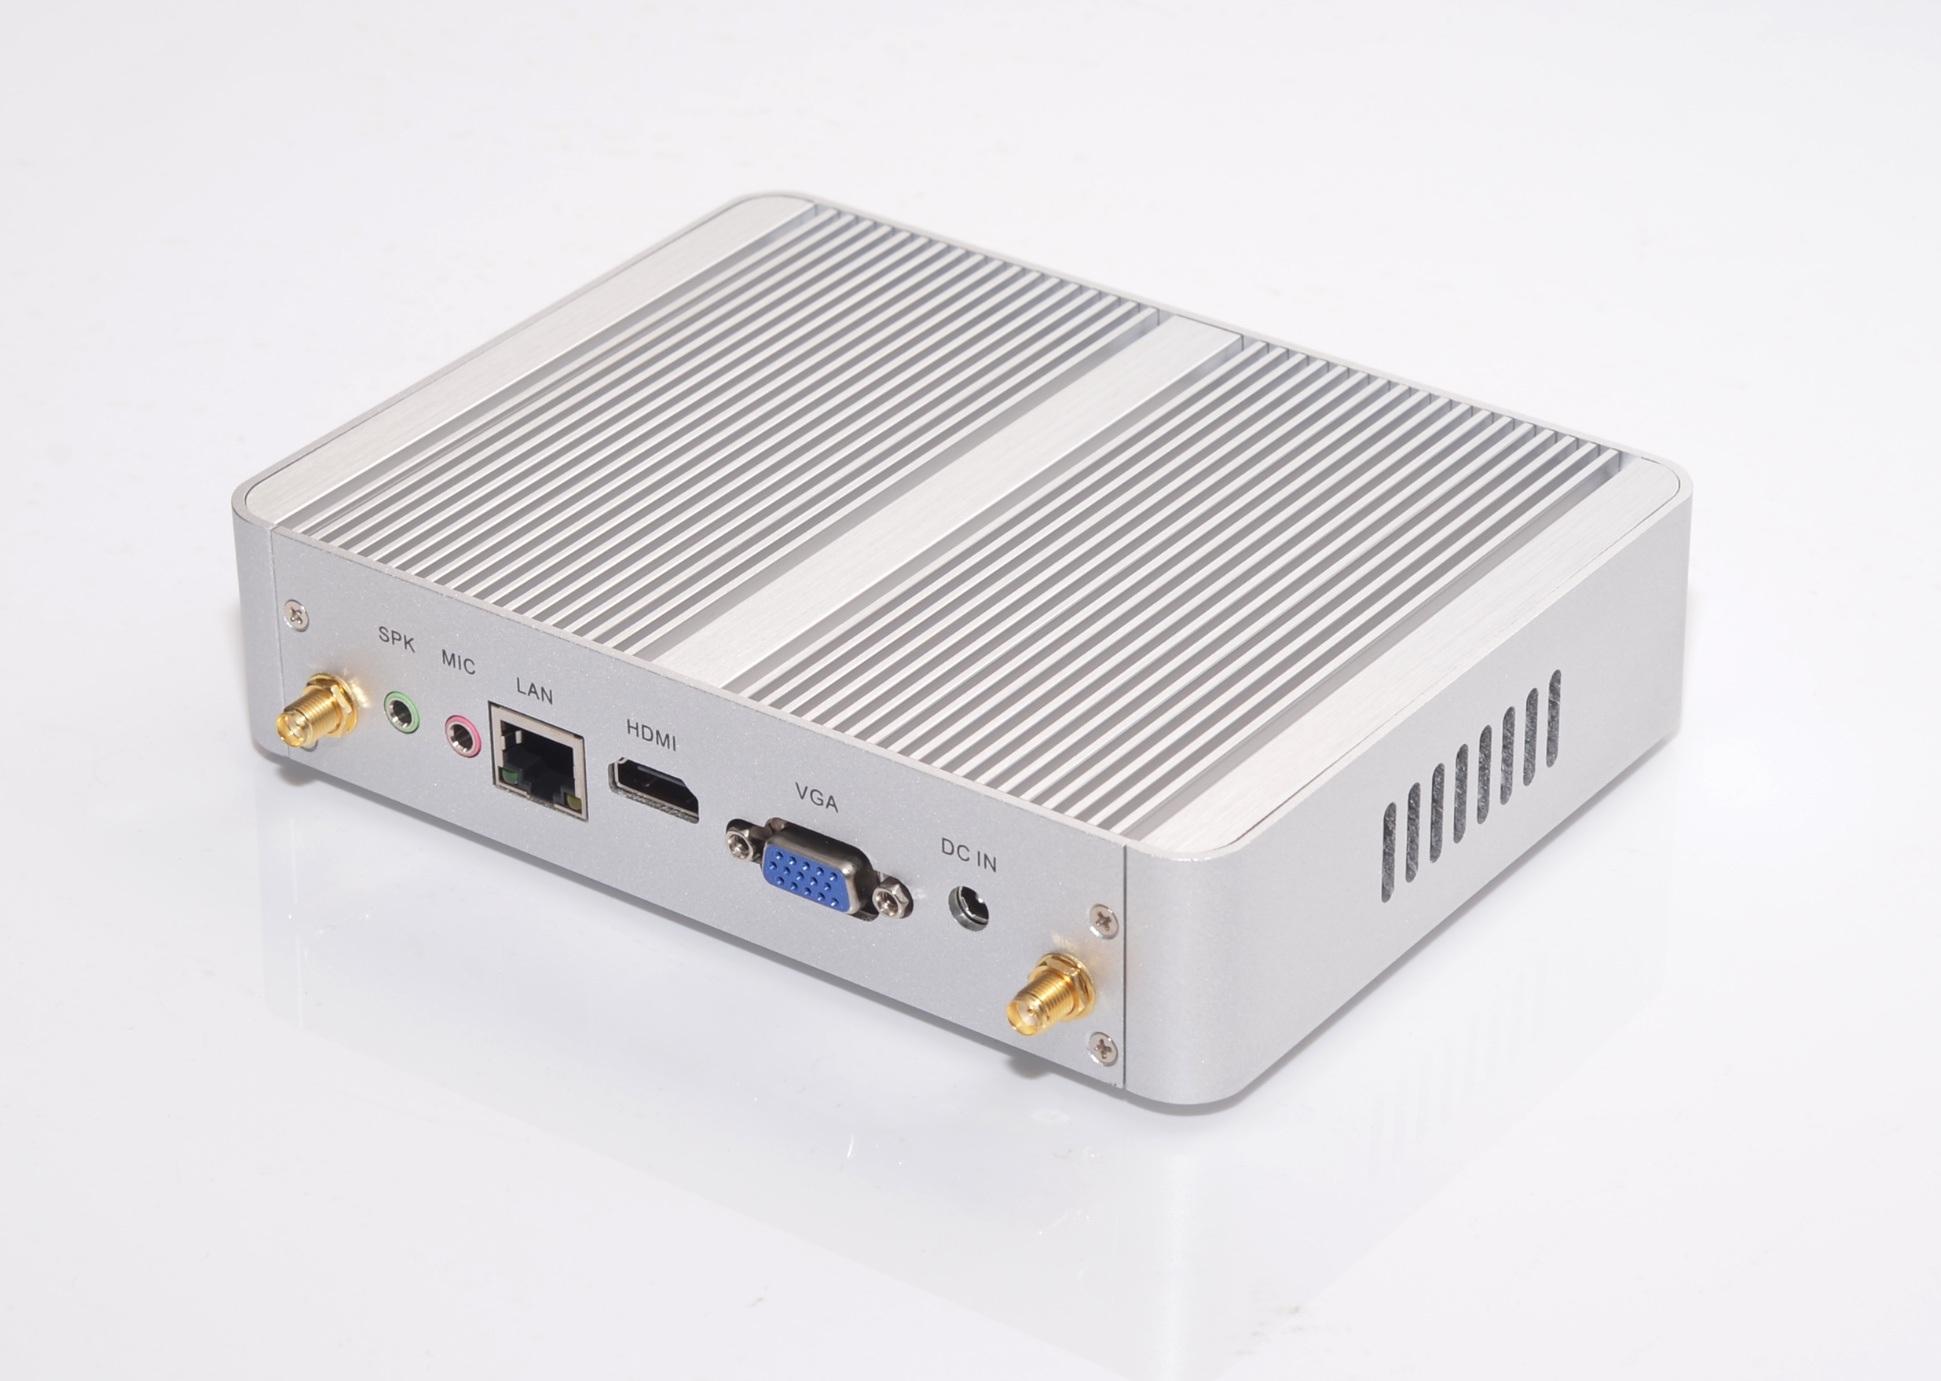 Promotion for Intel Core I3 6100u Mini PC (JFTC6100US)